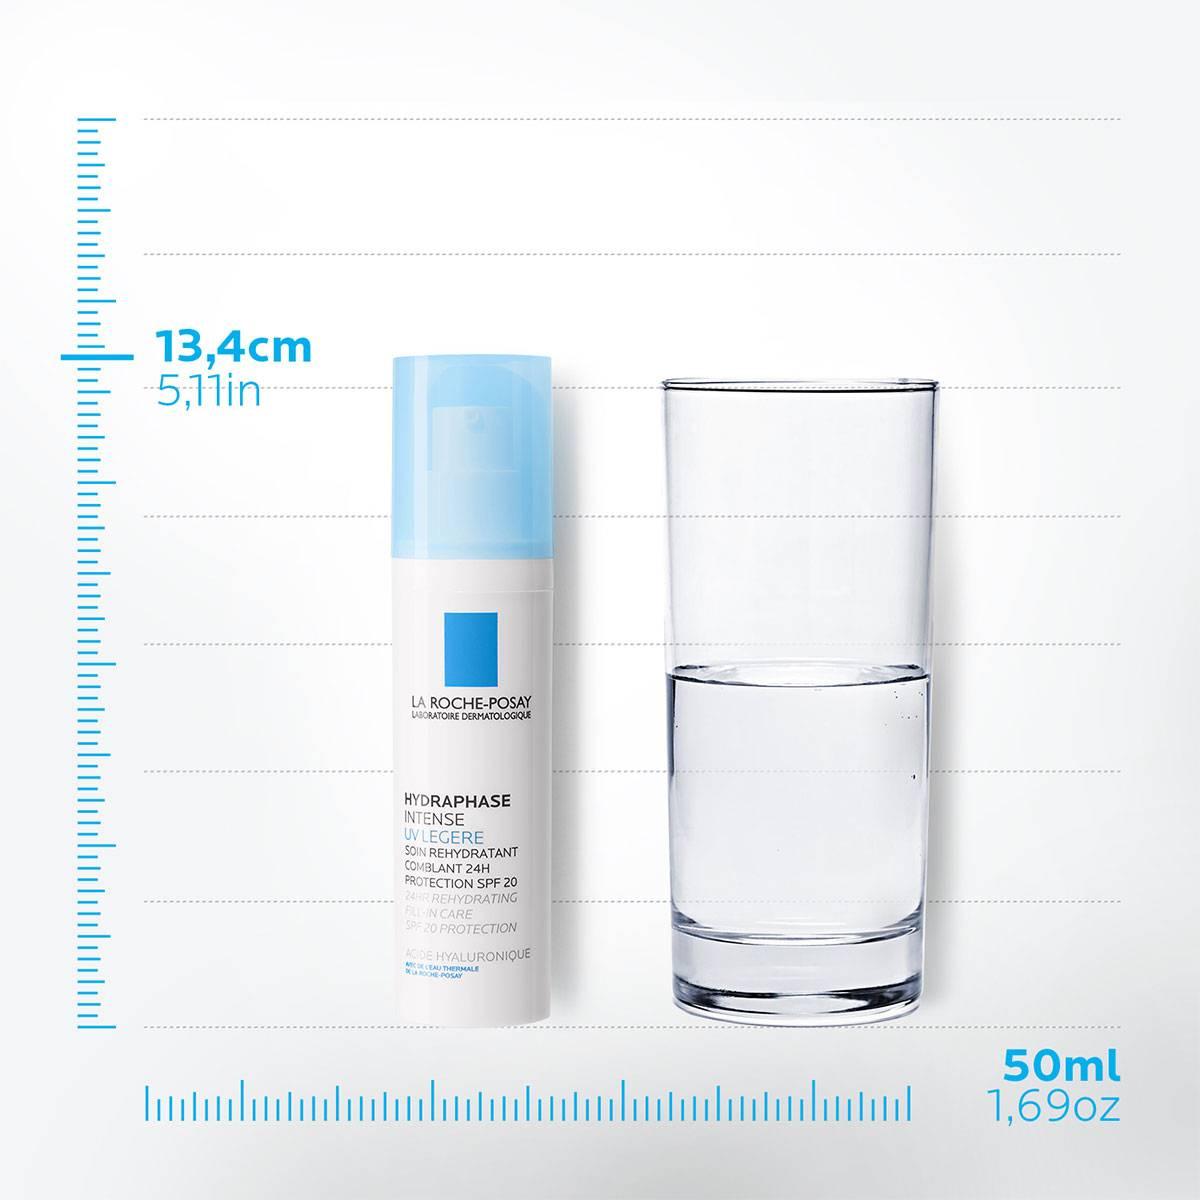 Hydraphase UV Intense Light Spf20 50 ml | La Roche Posay